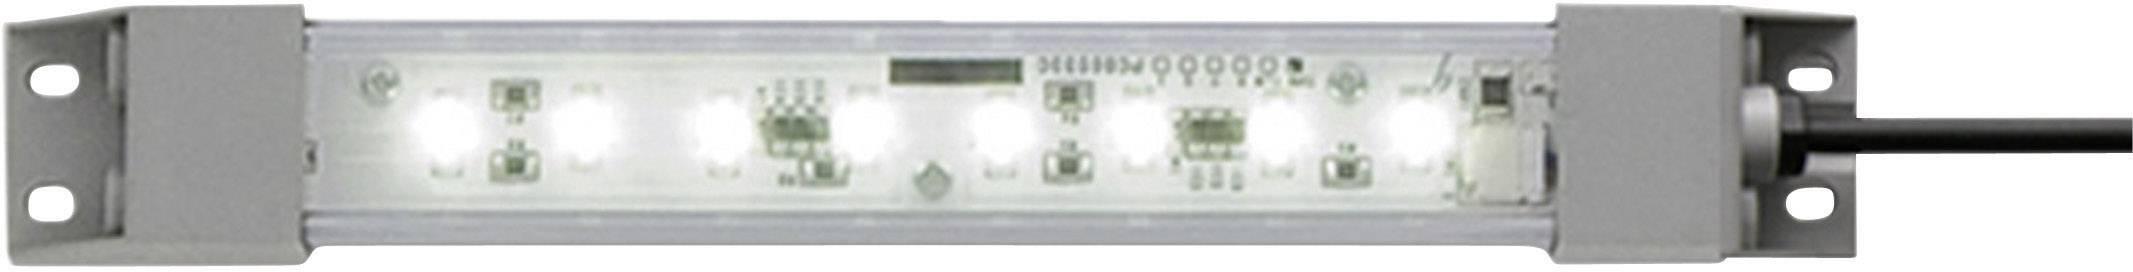 Idec LF1B-NB3P-2THWW2-3M, biela, 160 lm, 2.9 W, 24 V/DC